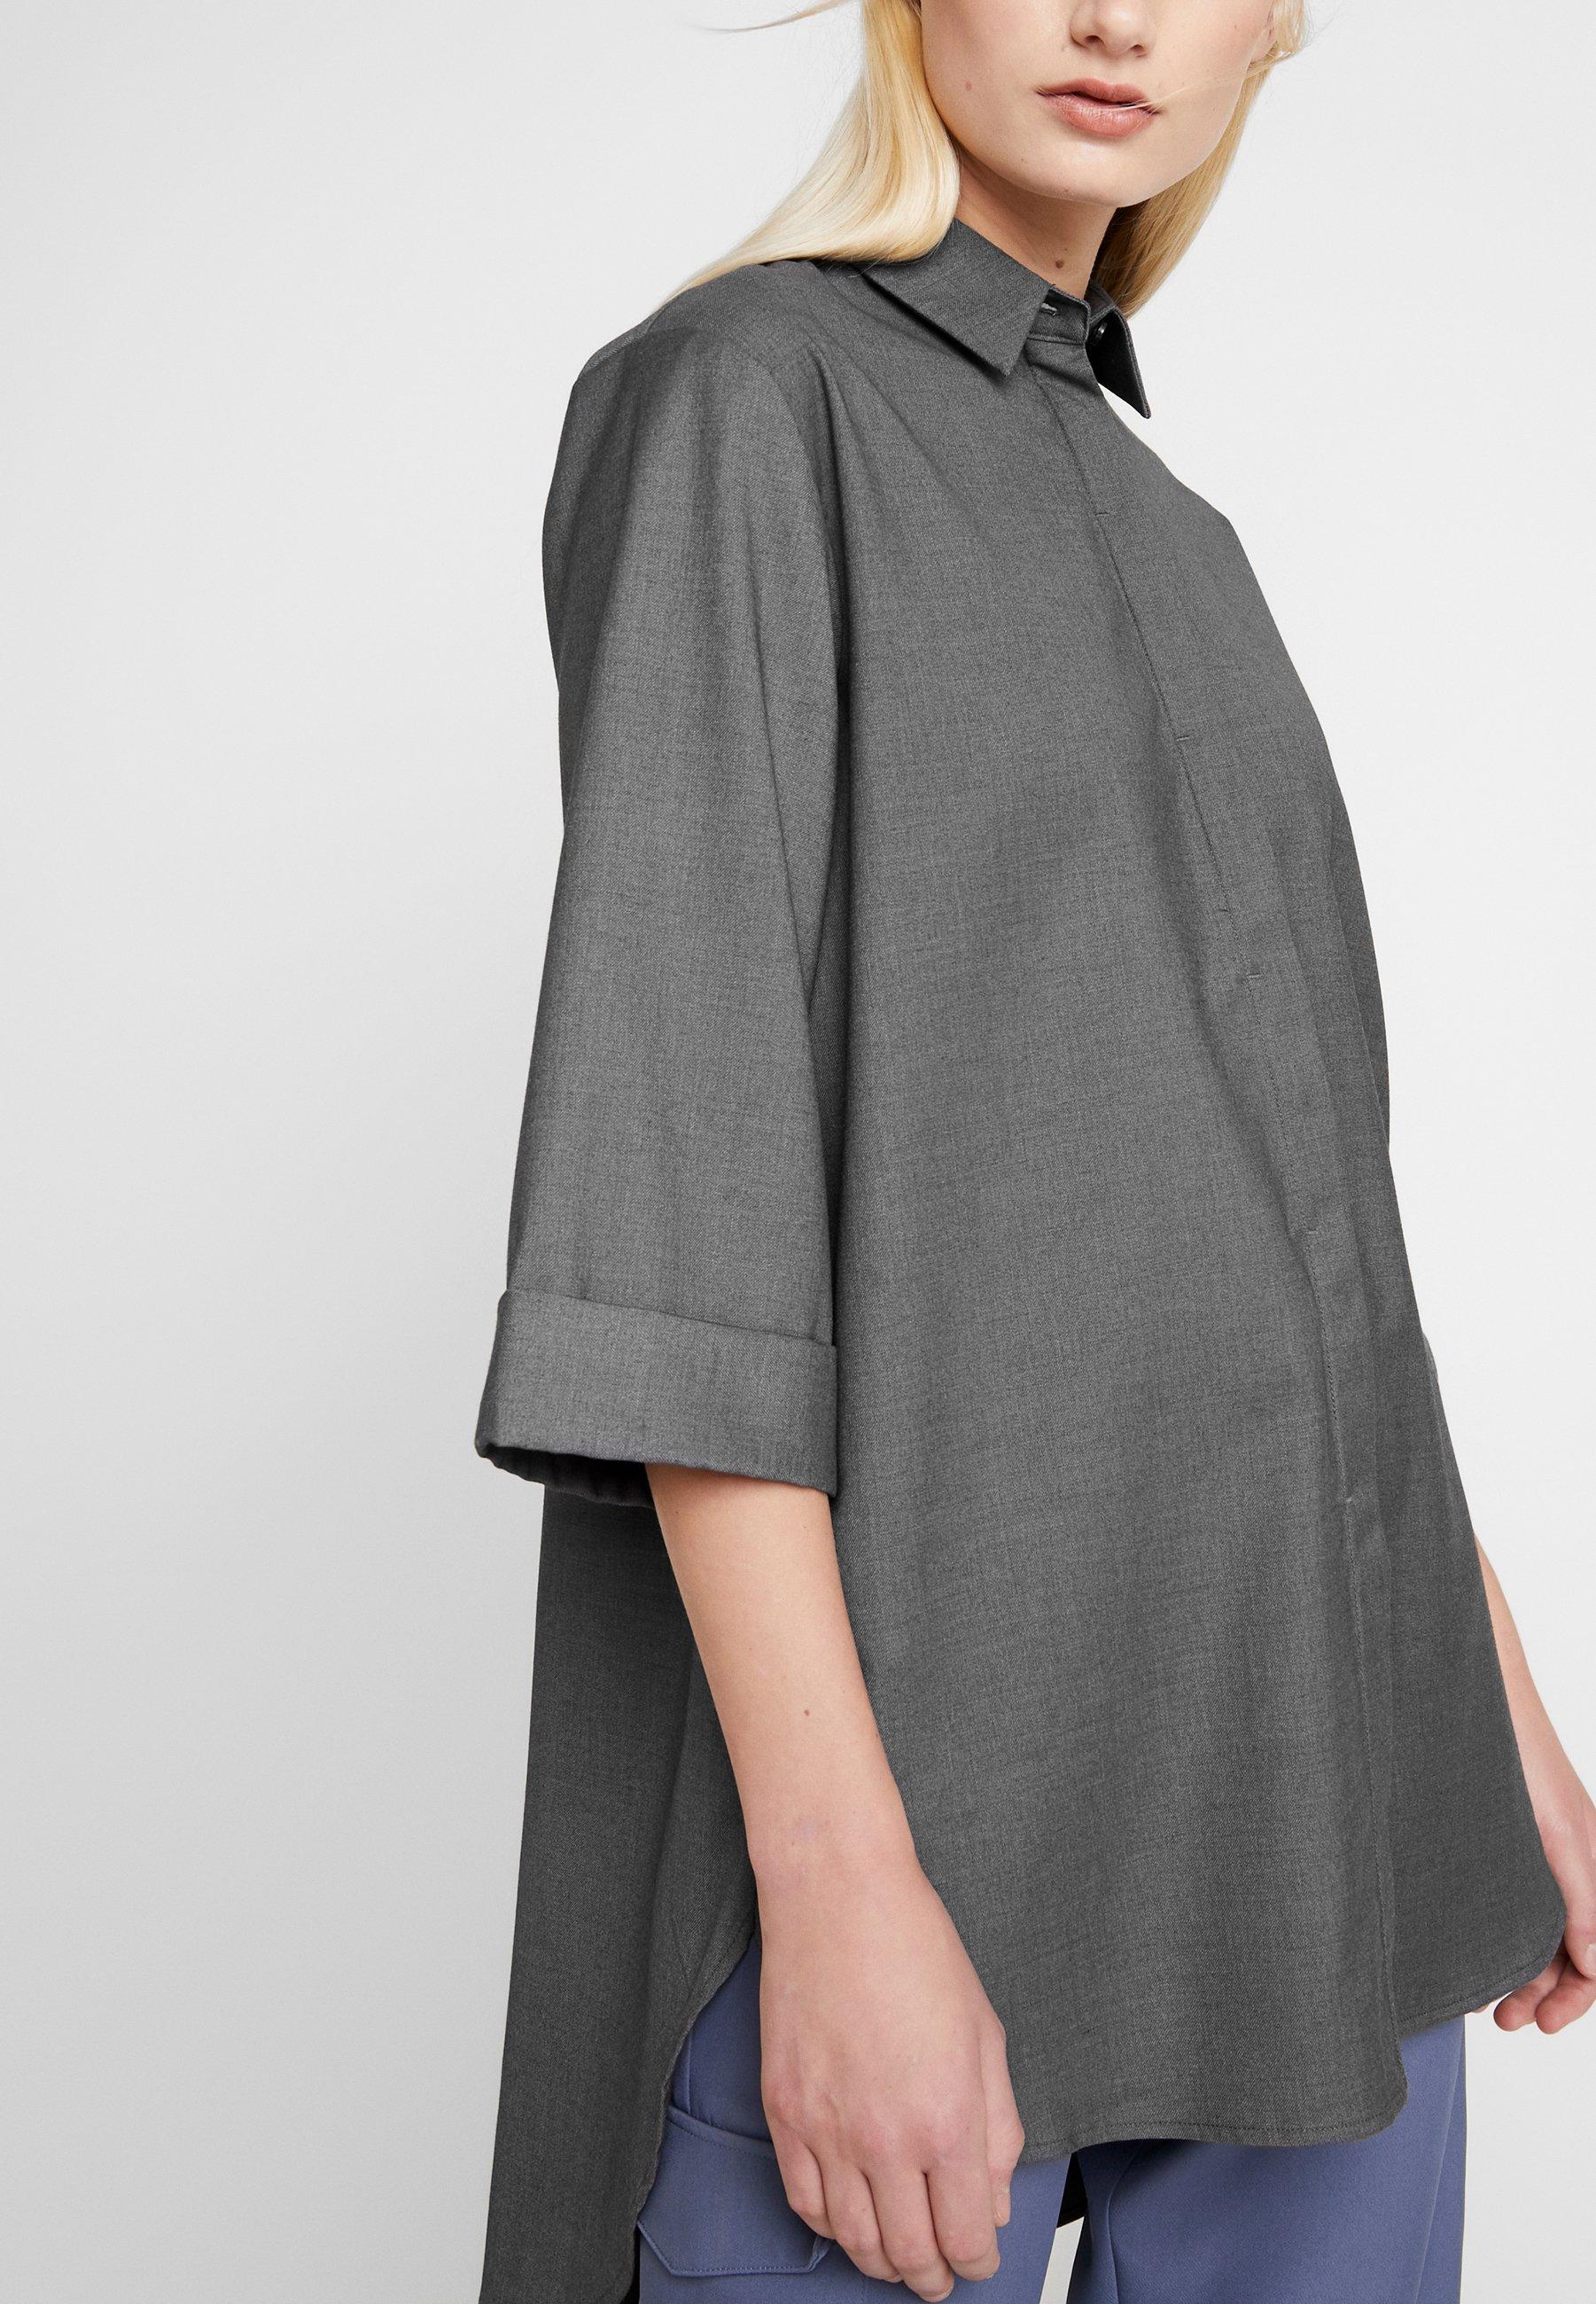 NORR HARLEY Skjorte dark greymørkegrå Zalando.no